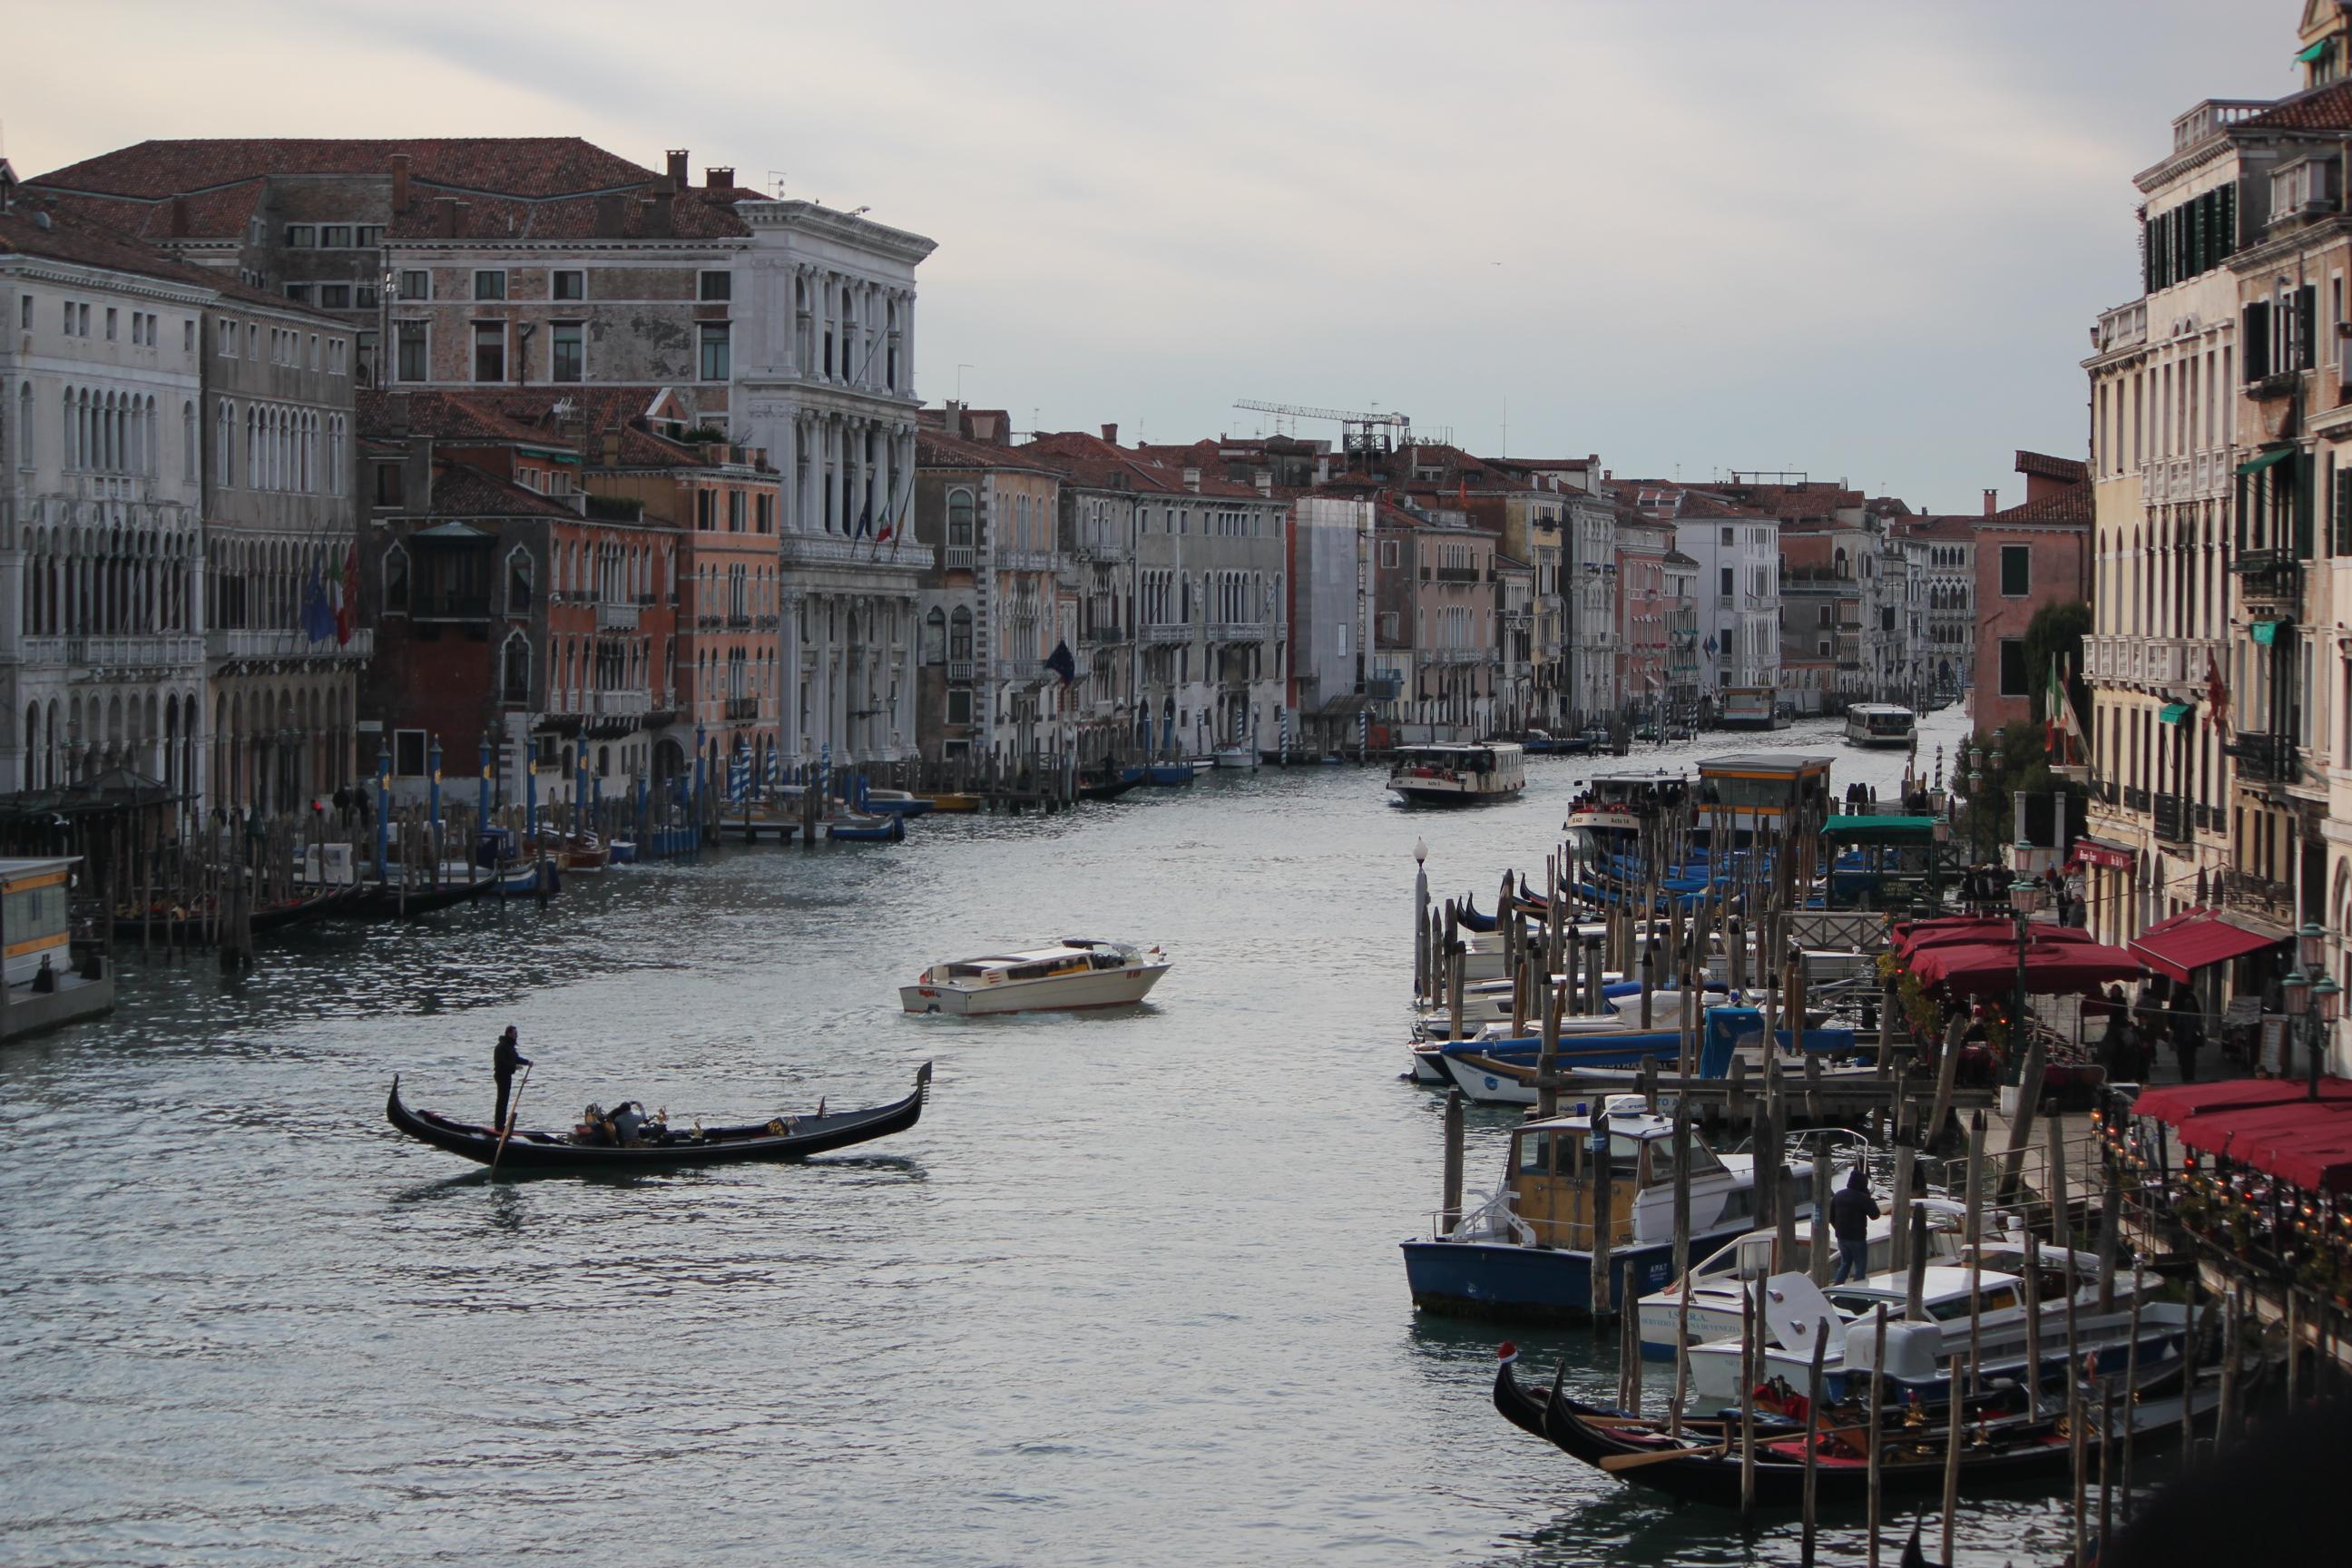 City View; Venice, Italy; 2011